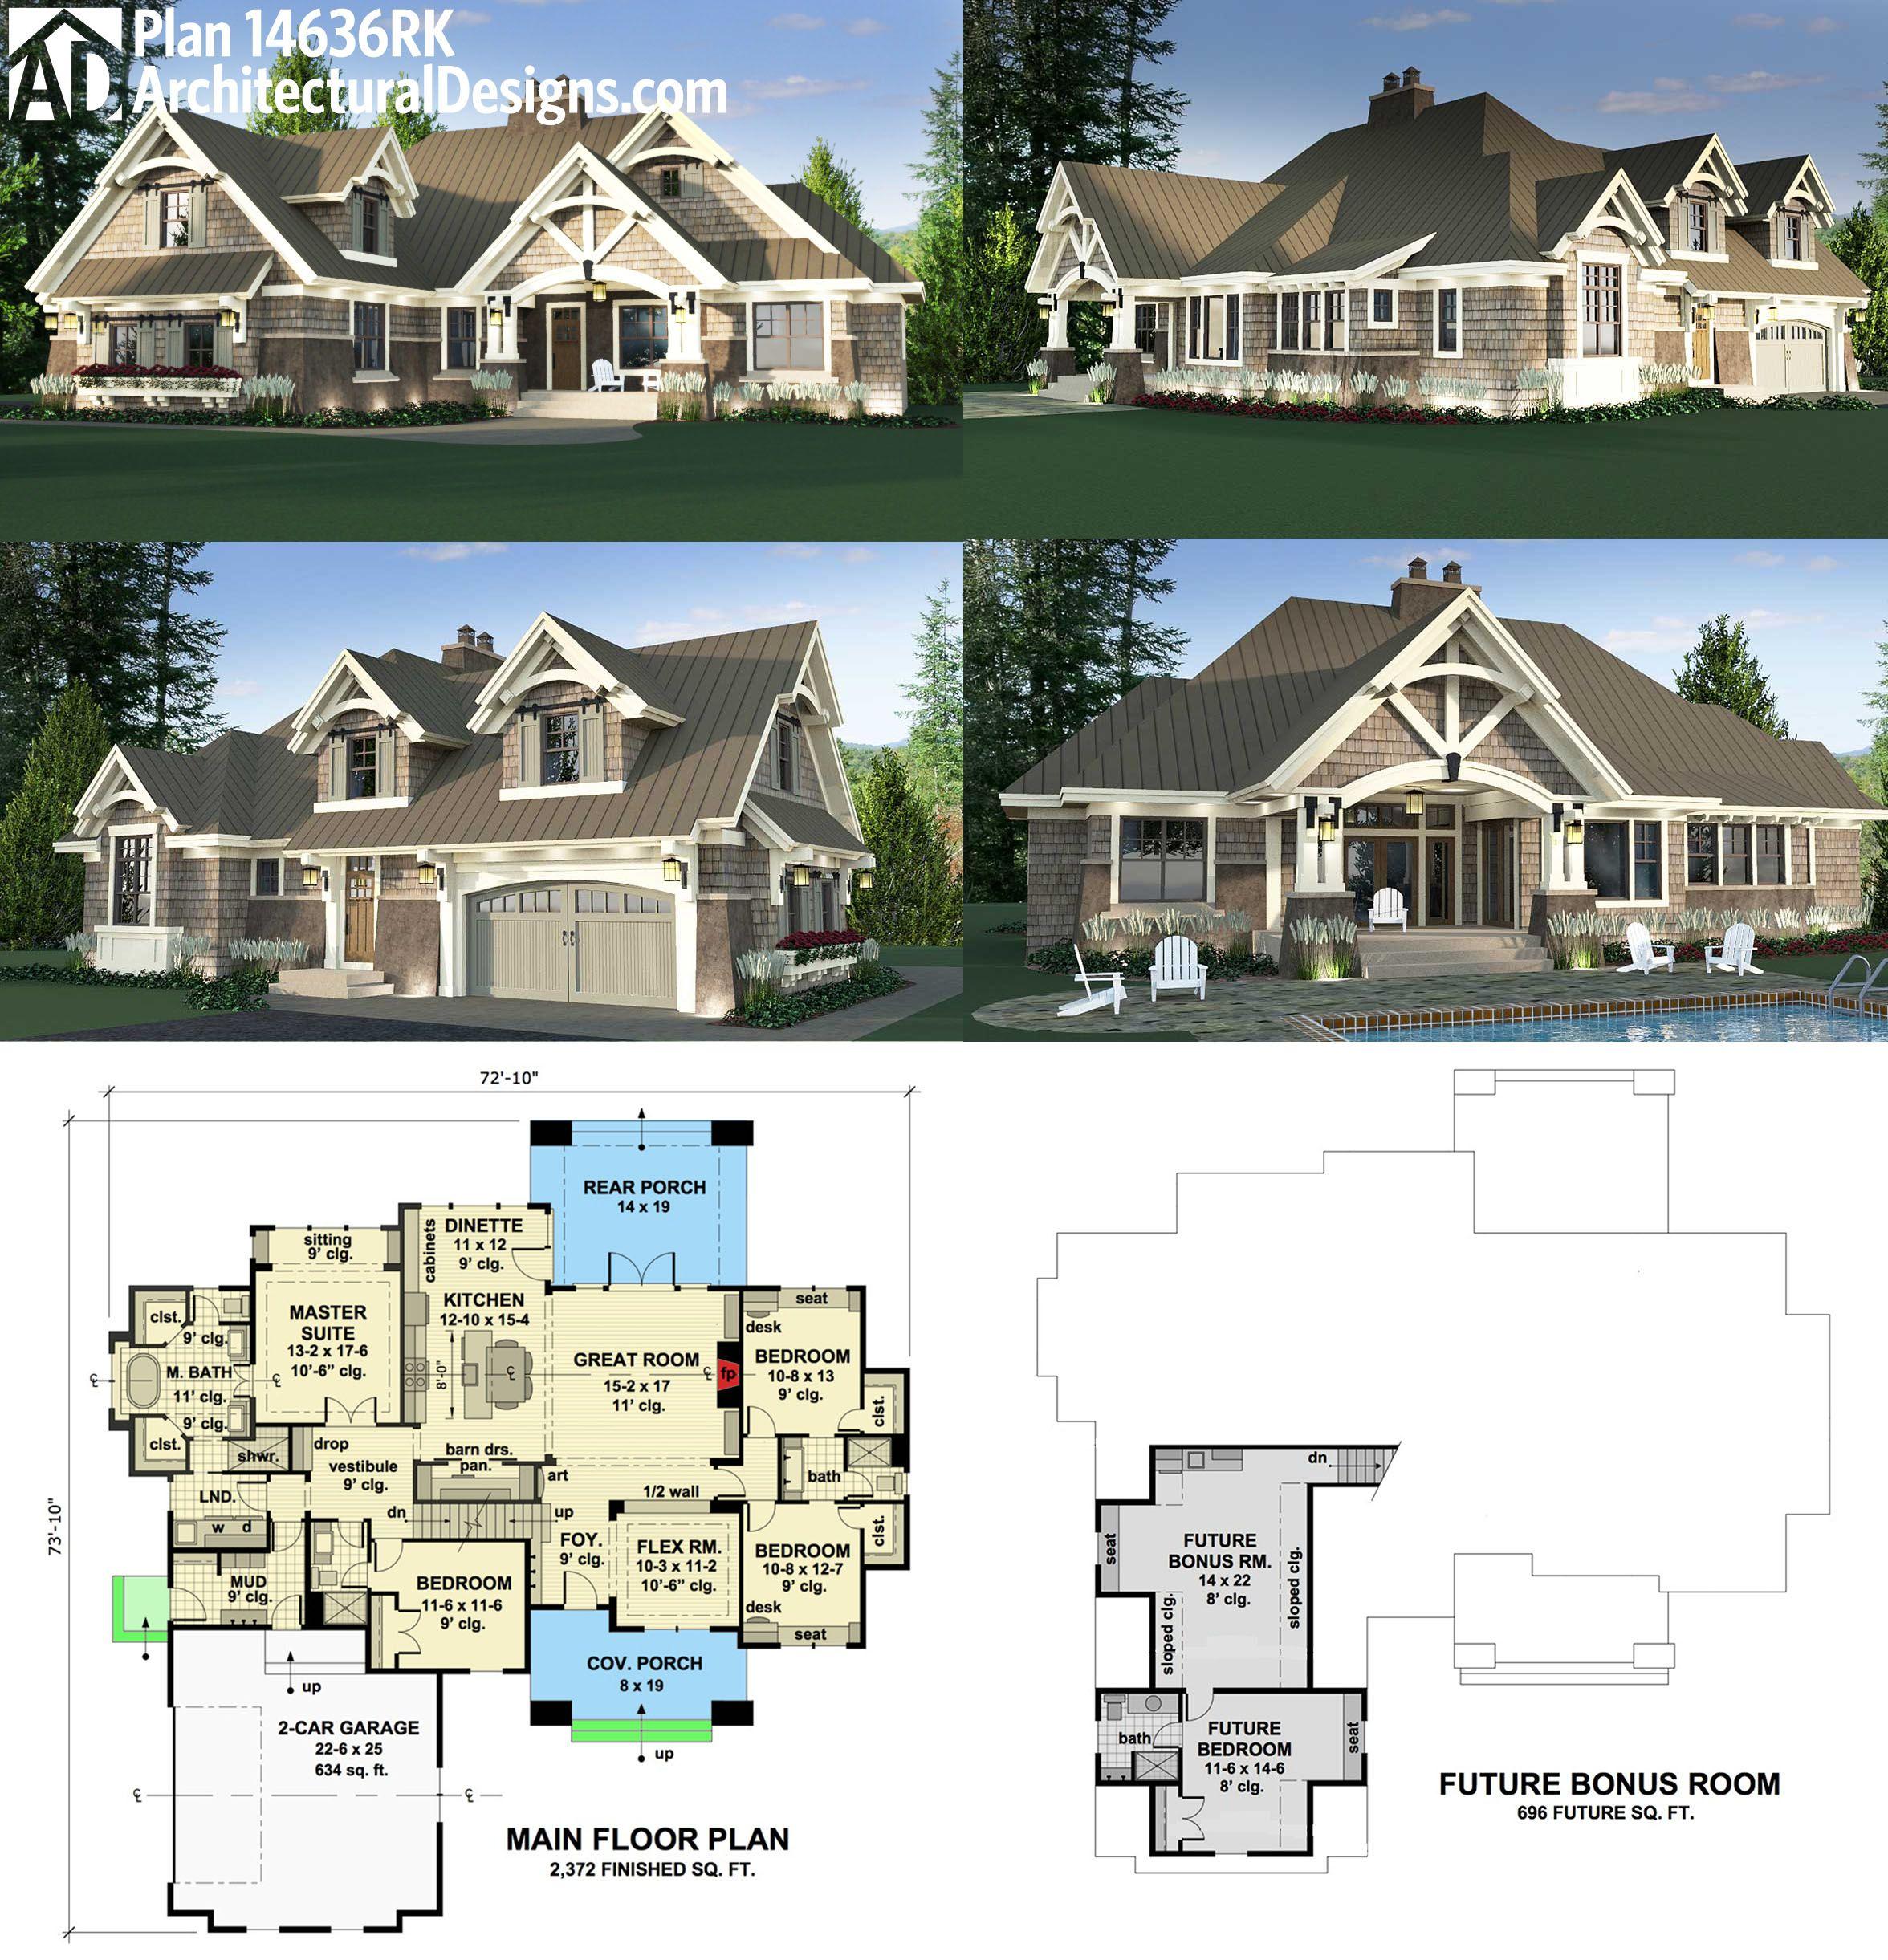 Plan 14636RK Charming Details Architectural design house plans